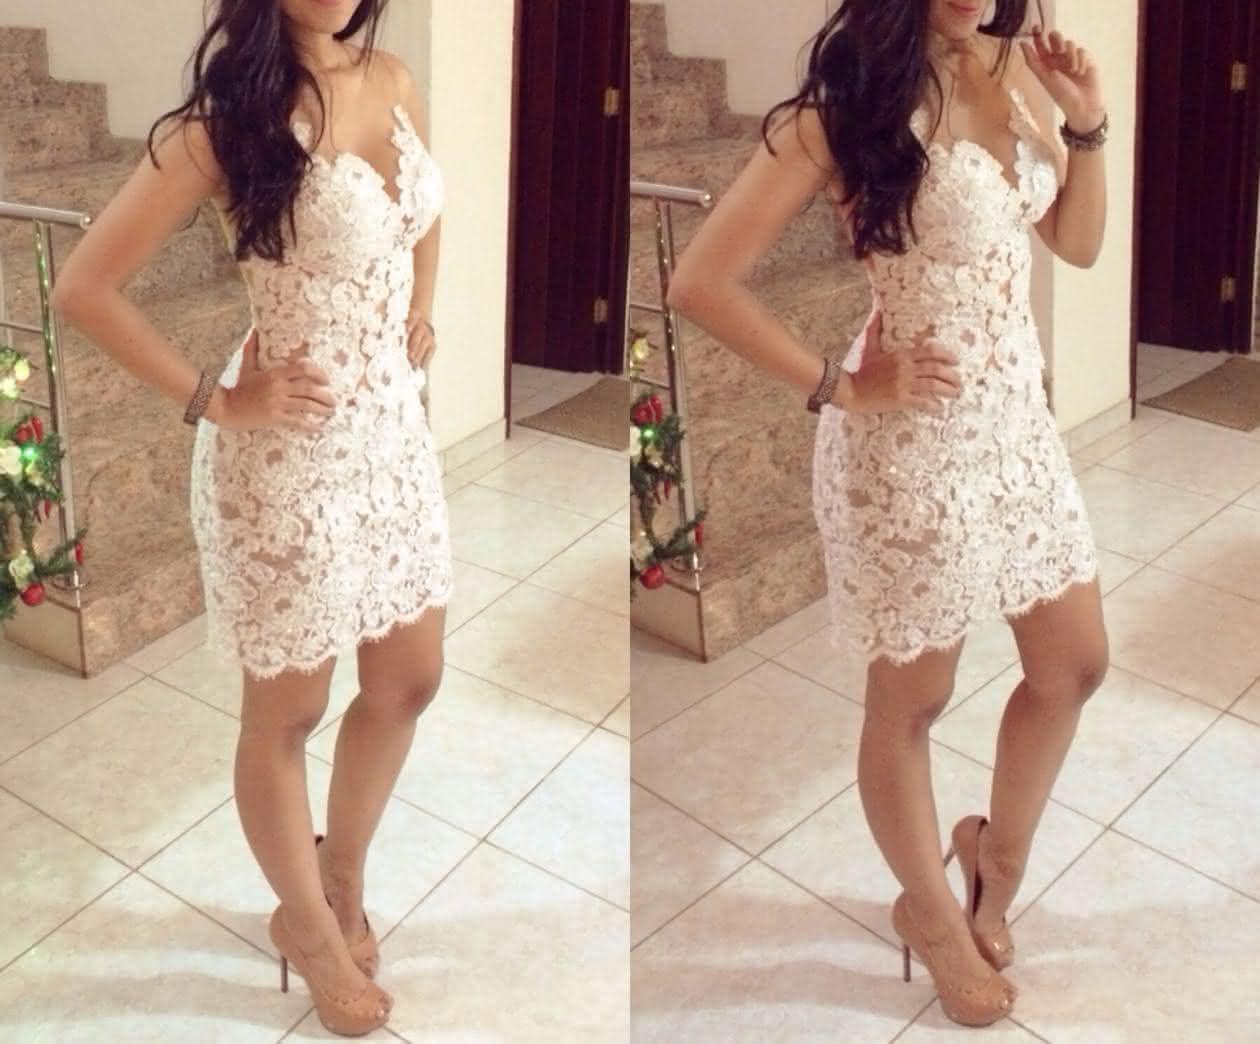 vestido-noiva-festa-renda-branca-efeito-nude-transparente-ombro-colo-costas-transparentes-m_3_